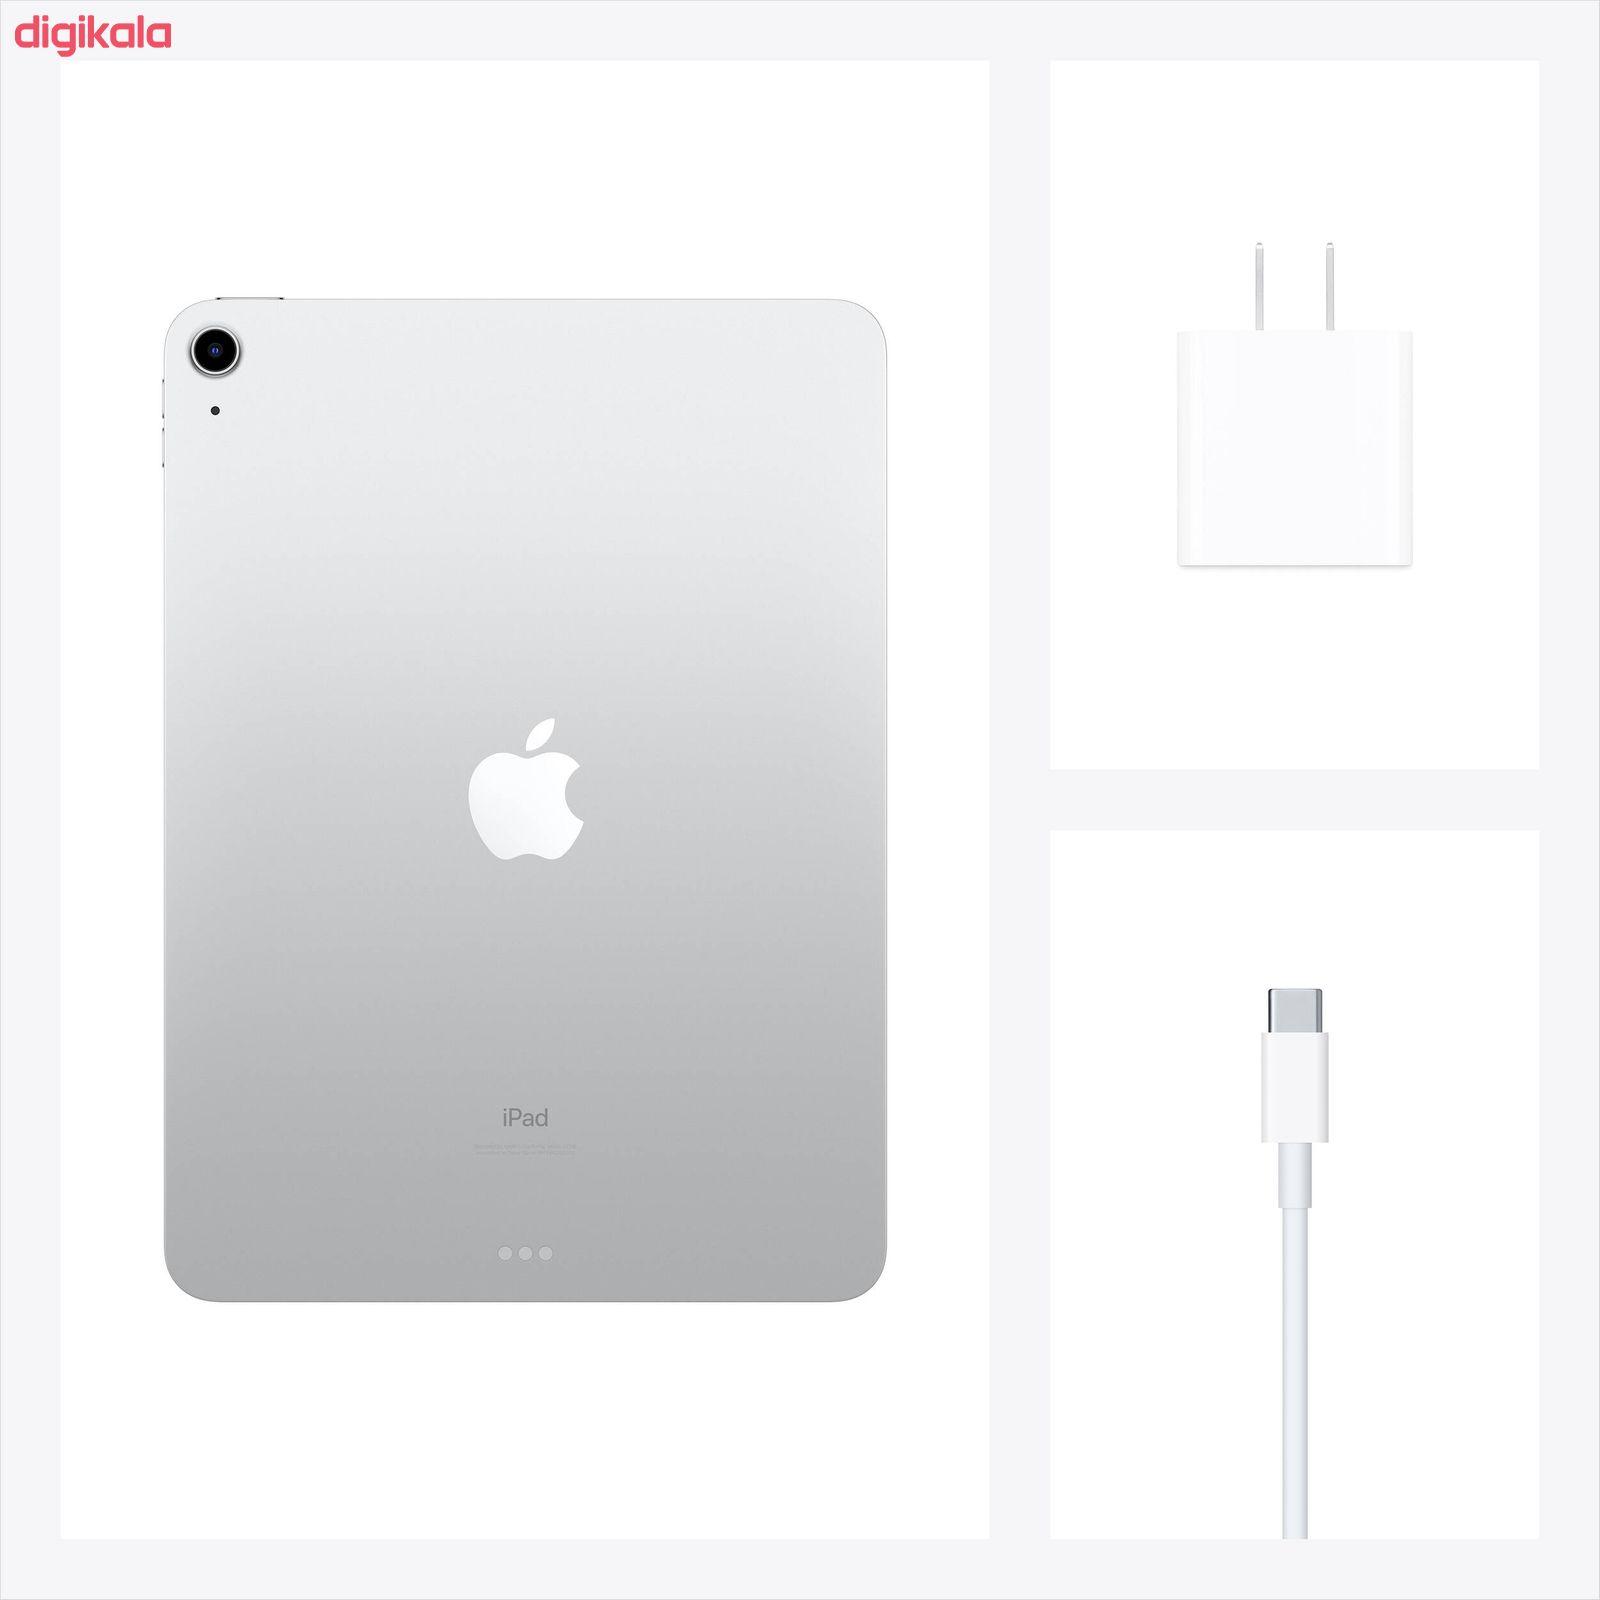 تبلت اپل مدل iPad Air 10.9 inch 2020 WiFi ظرفیت 256 گیگابایت  main 1 15